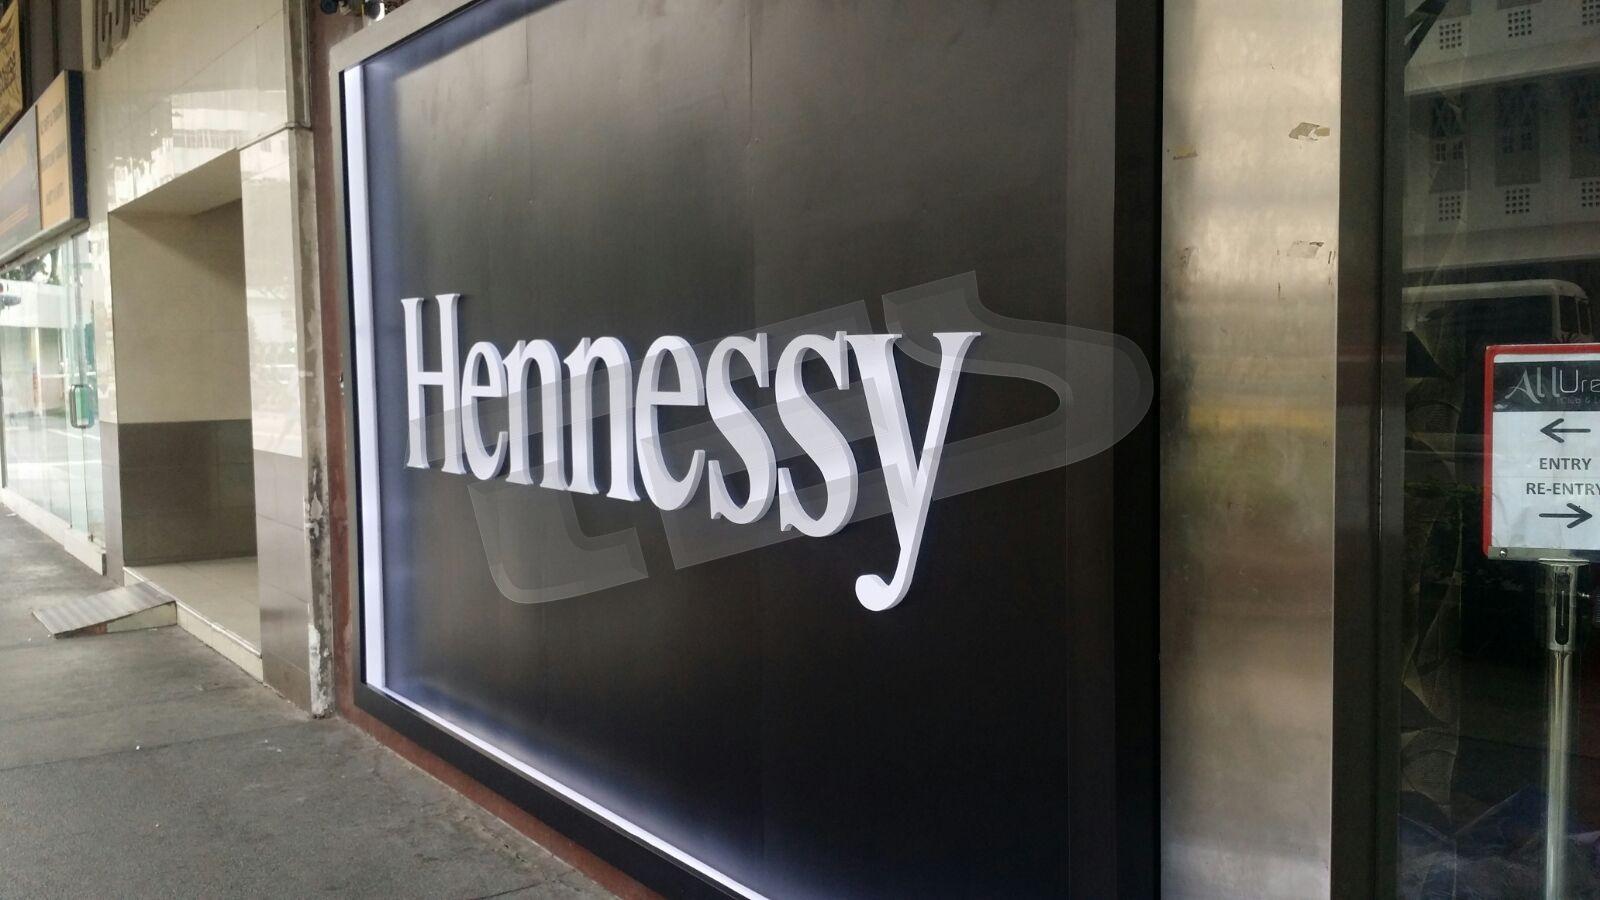 Hennesy3DImage